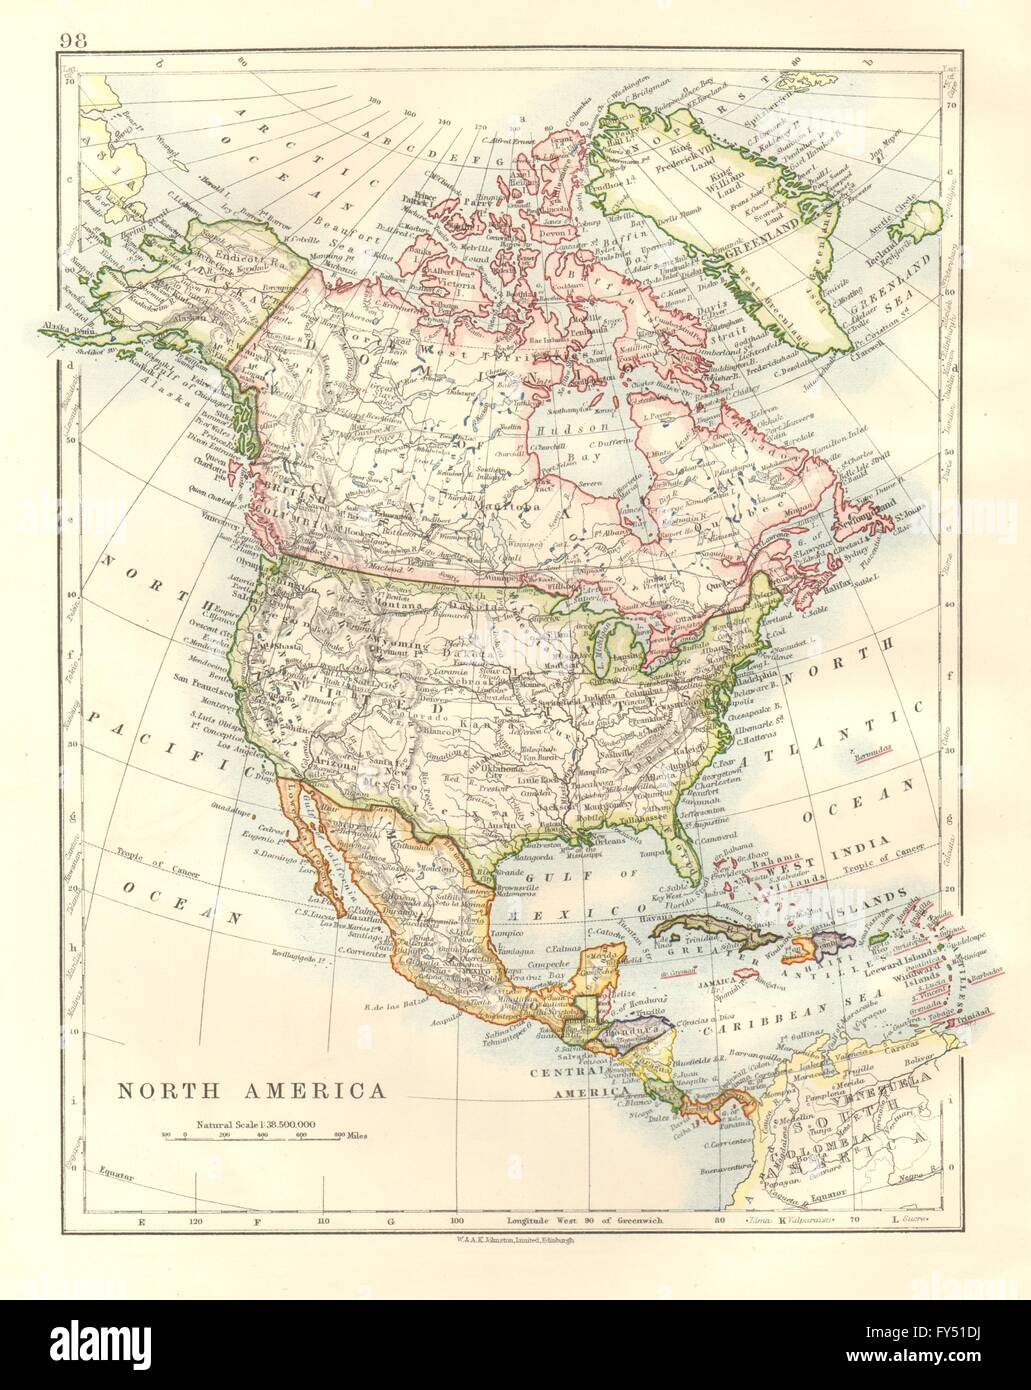 Map Of Usa And Canada And Mexico.North America Political Greenland Usa Canada Mexico Johnston 1920